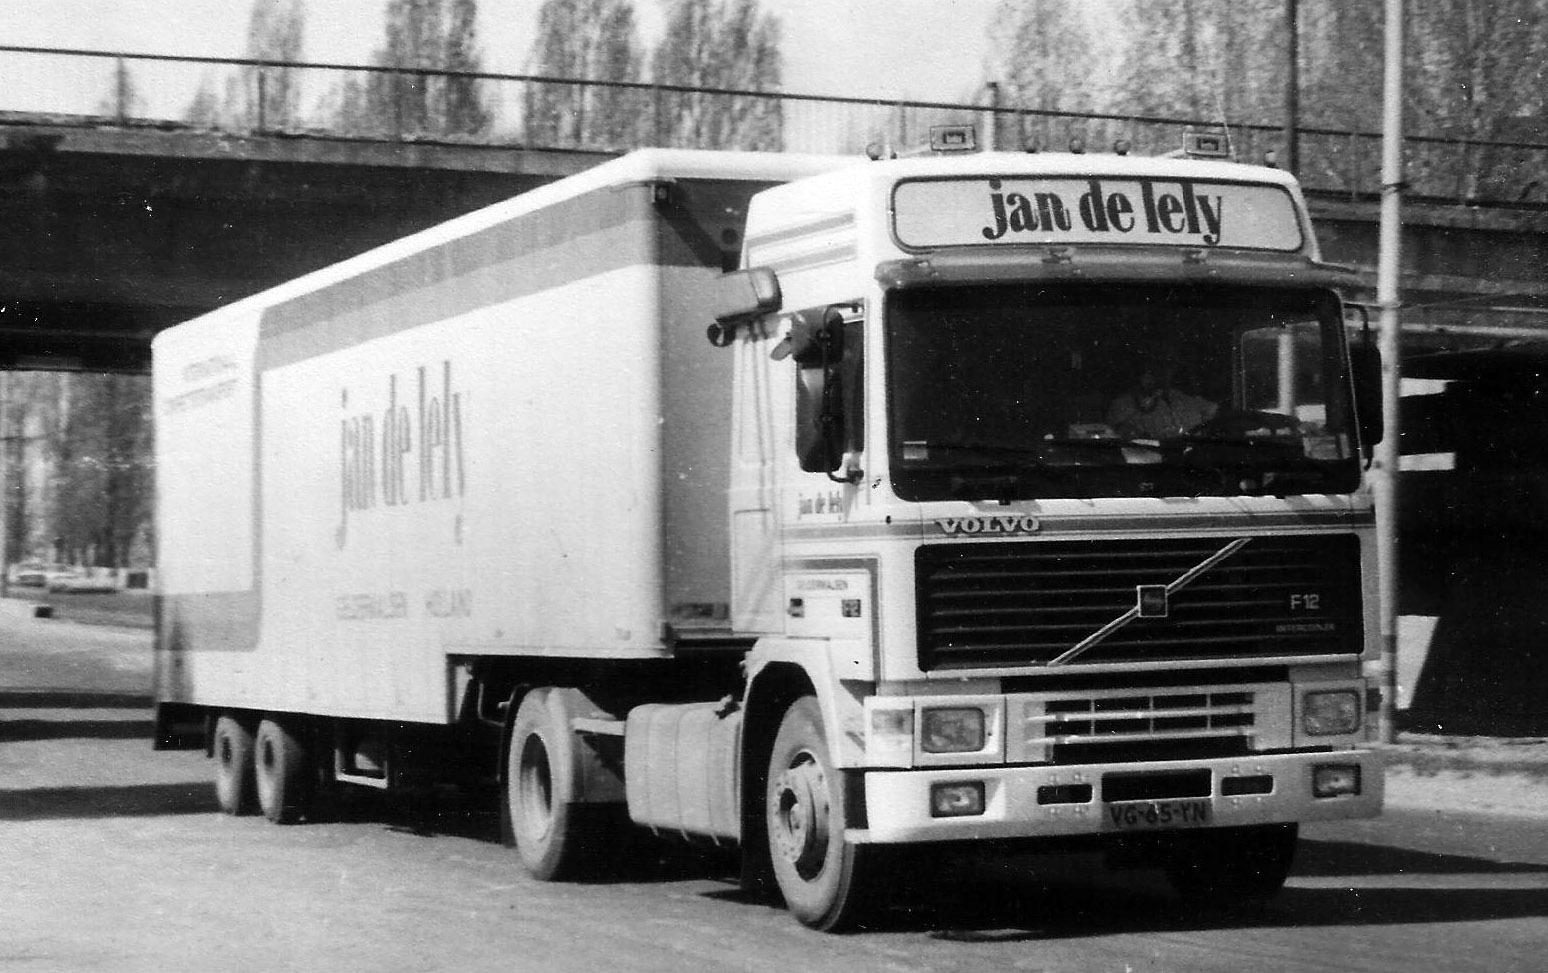 Gyorgy-Gyori-Oradea-back-in-the-80-s.--1